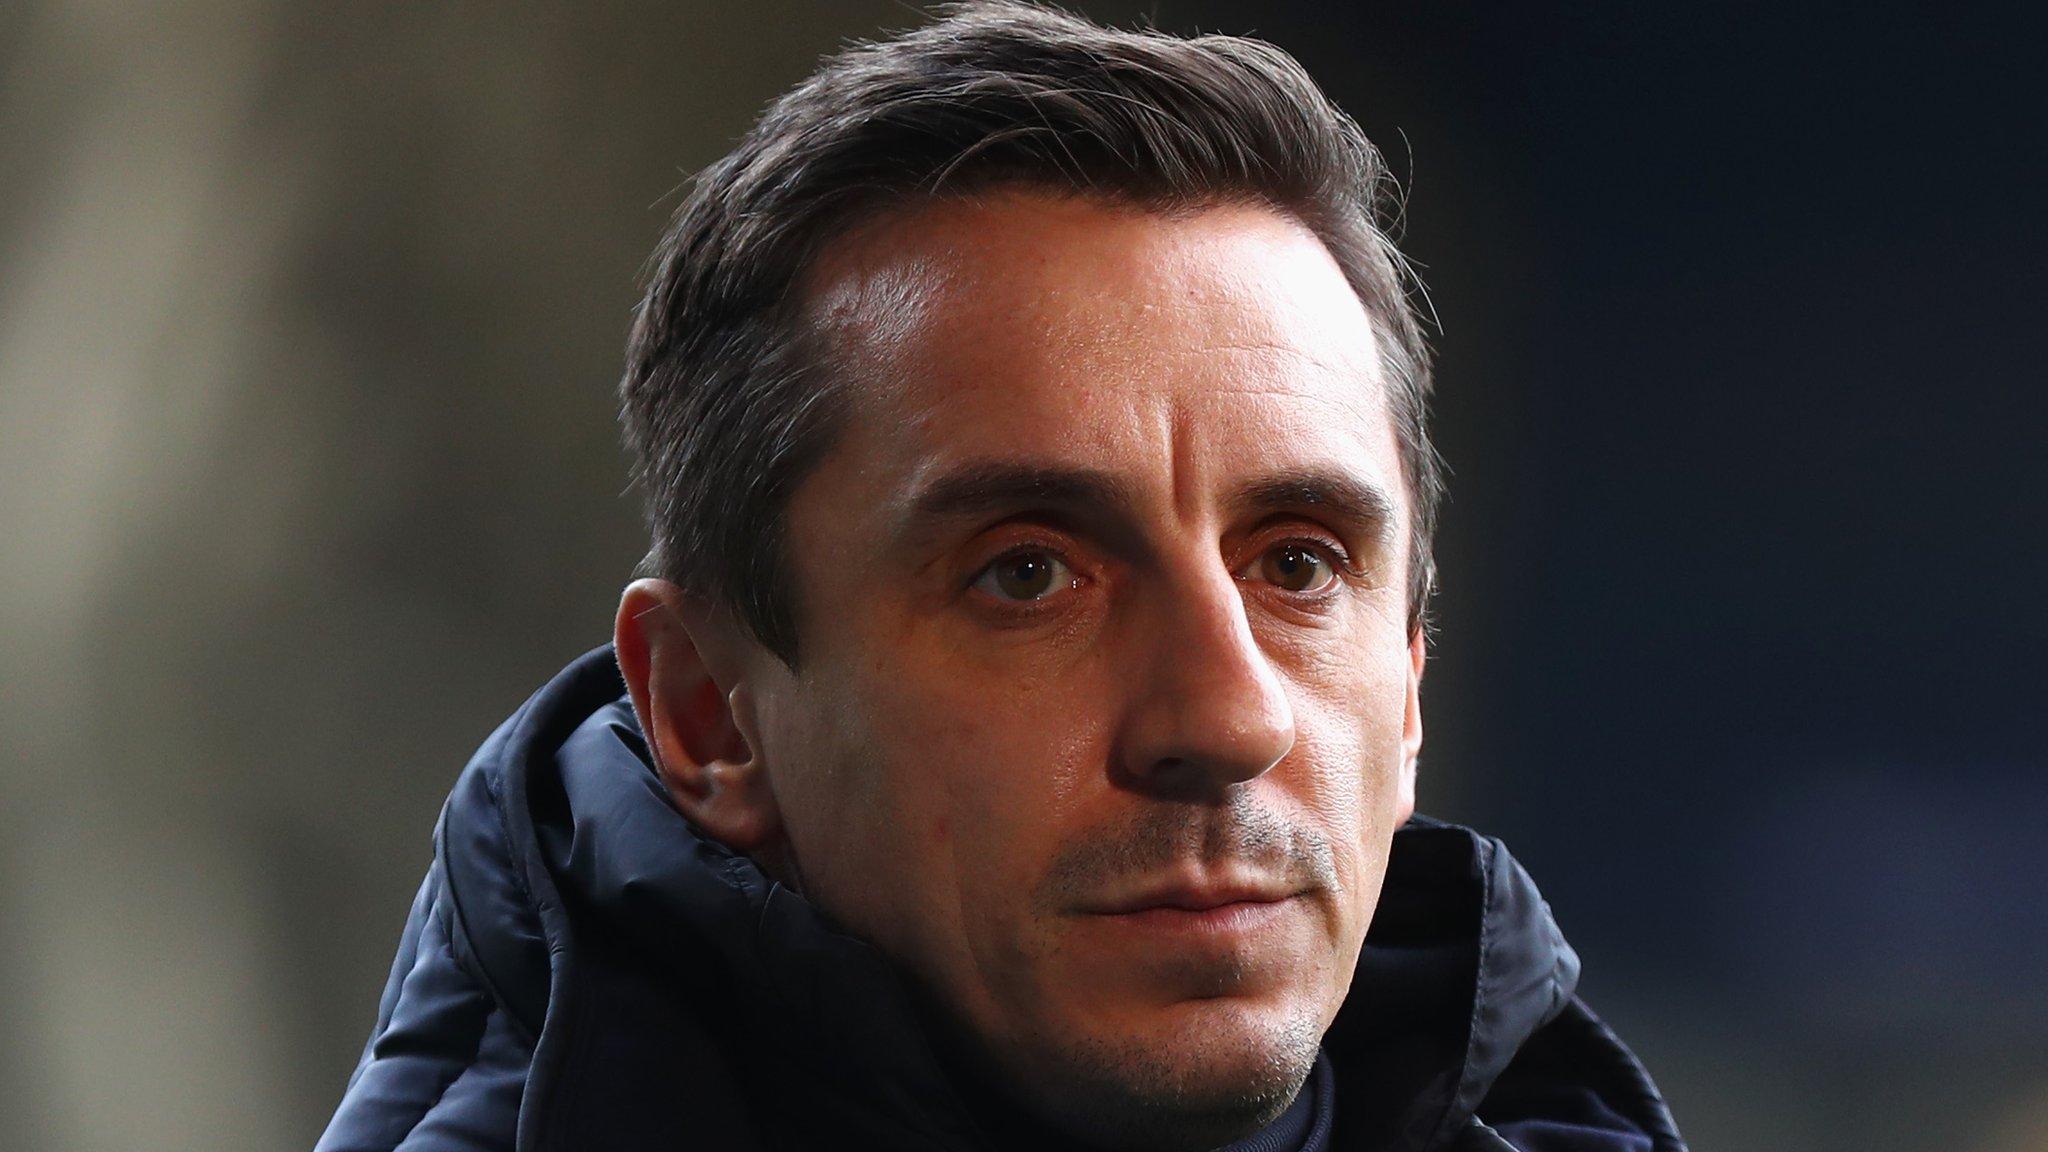 Motherwell boss lacks etiquette with Salford money talk - Neville